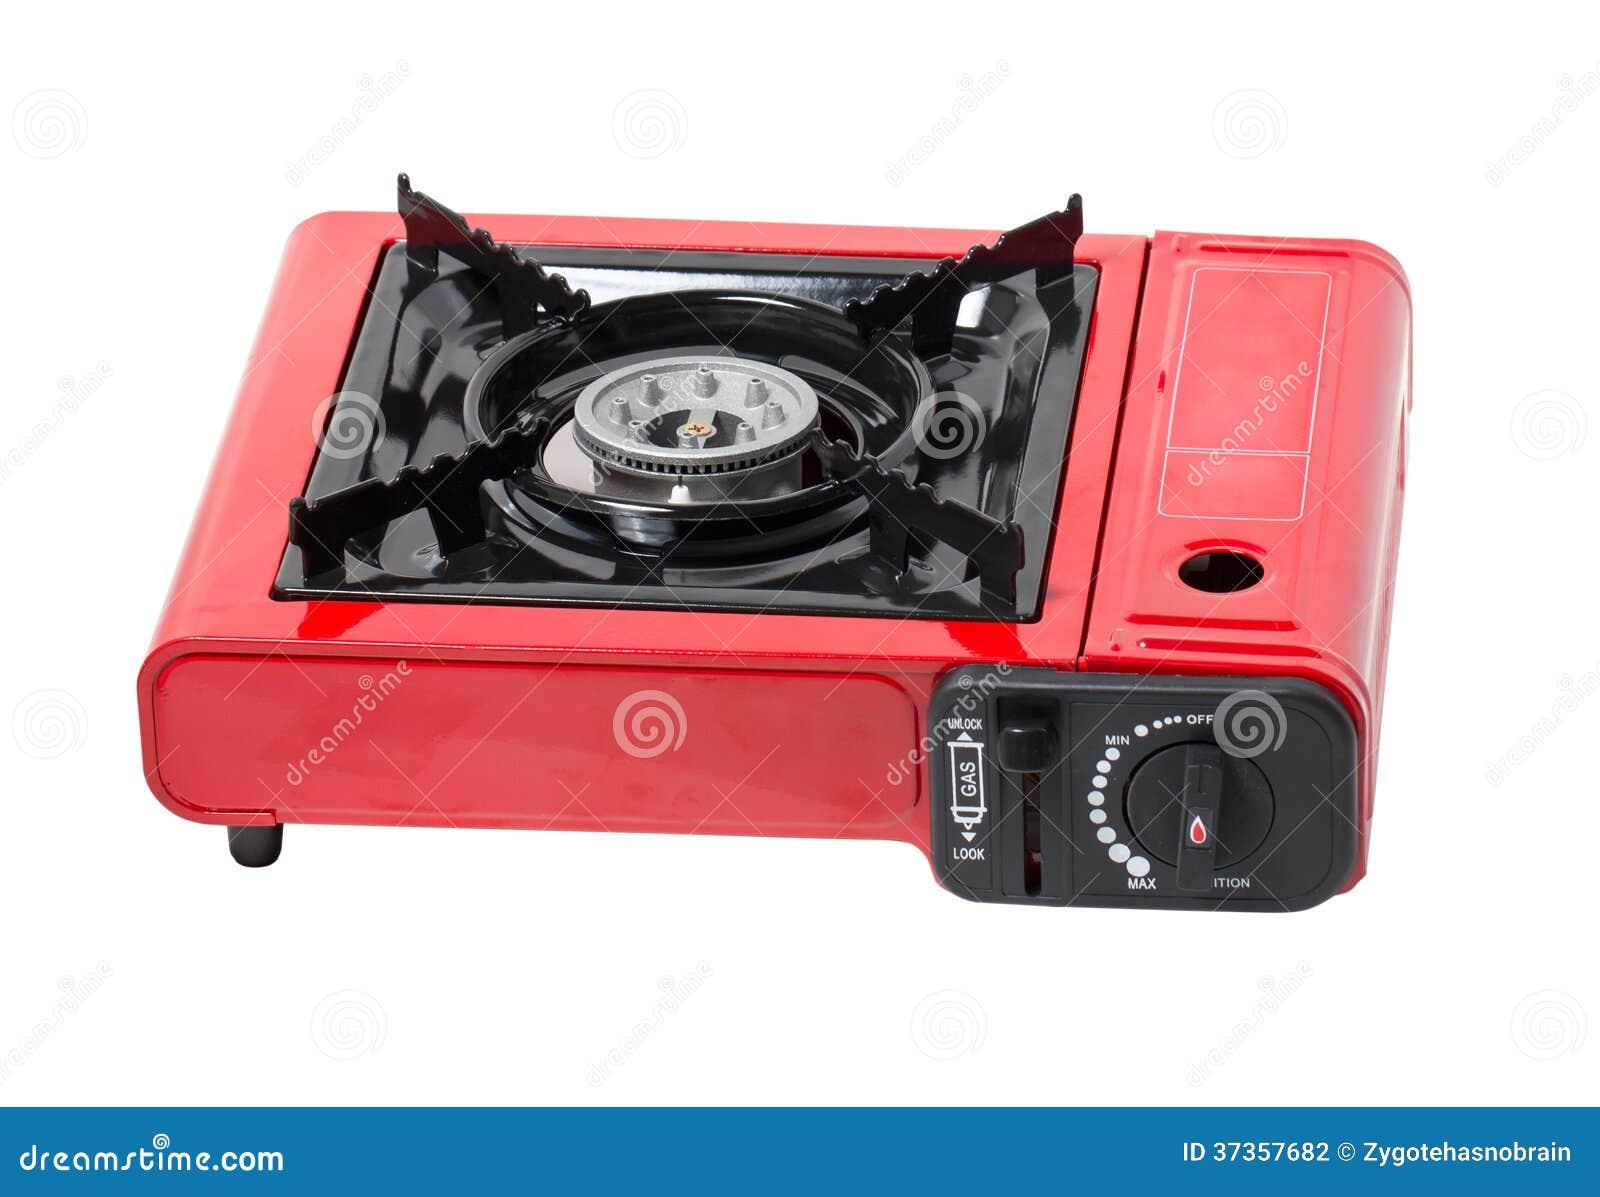 Portable Gas Stove.